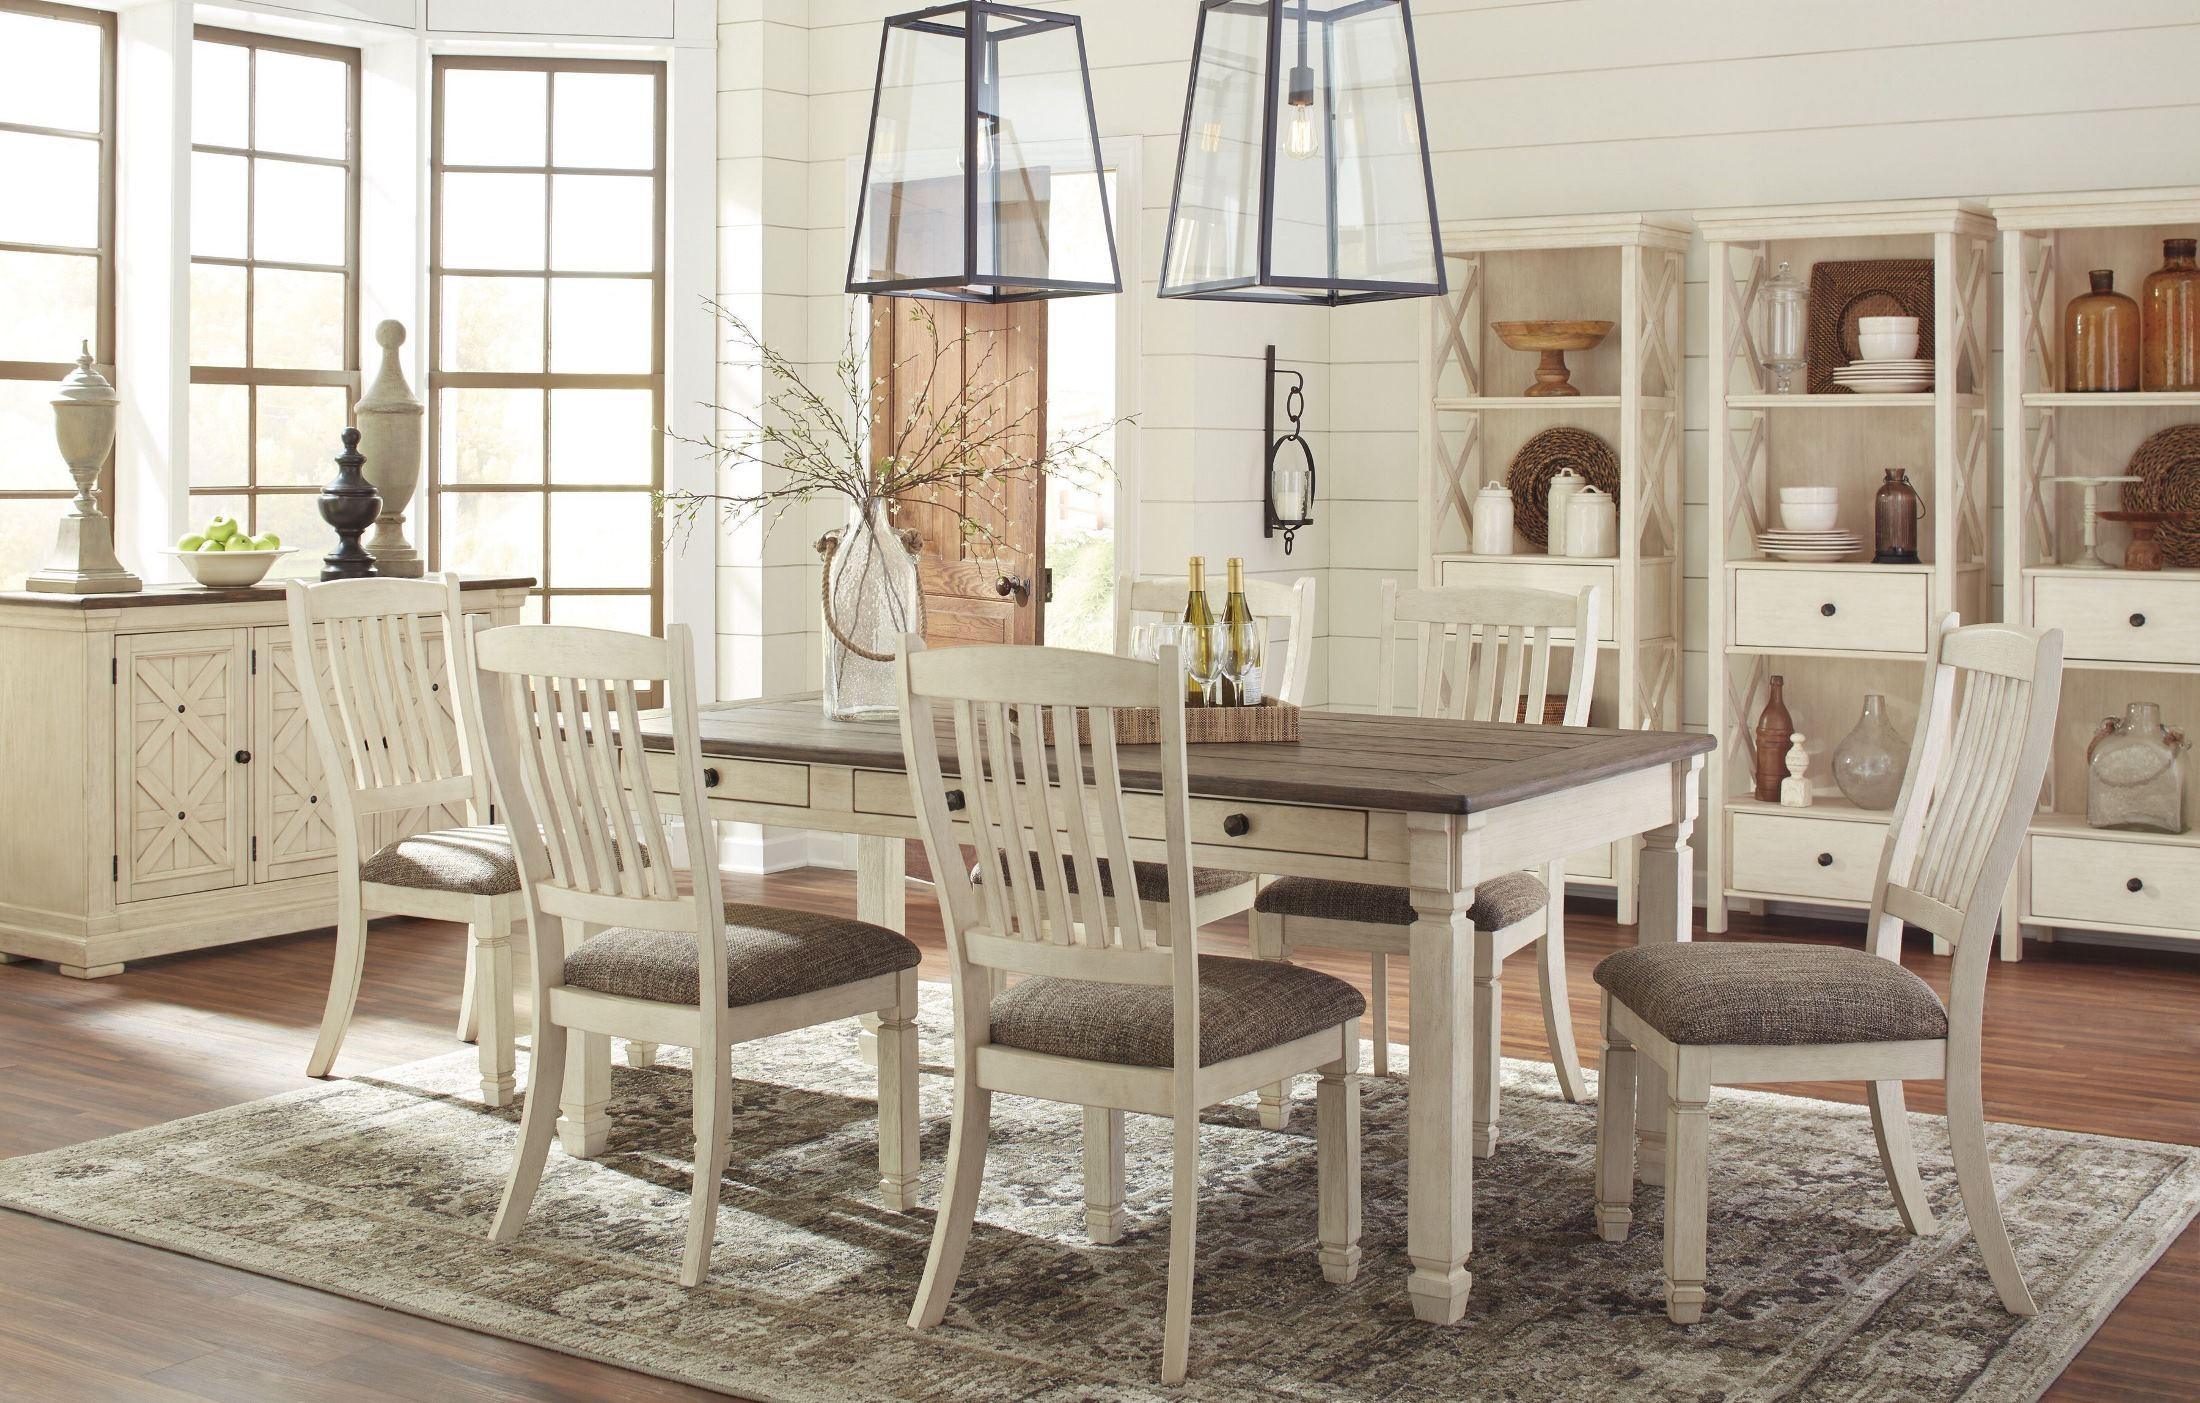 bolanburg white and gray rectangular dining room set d647 25 ashley. Black Bedroom Furniture Sets. Home Design Ideas